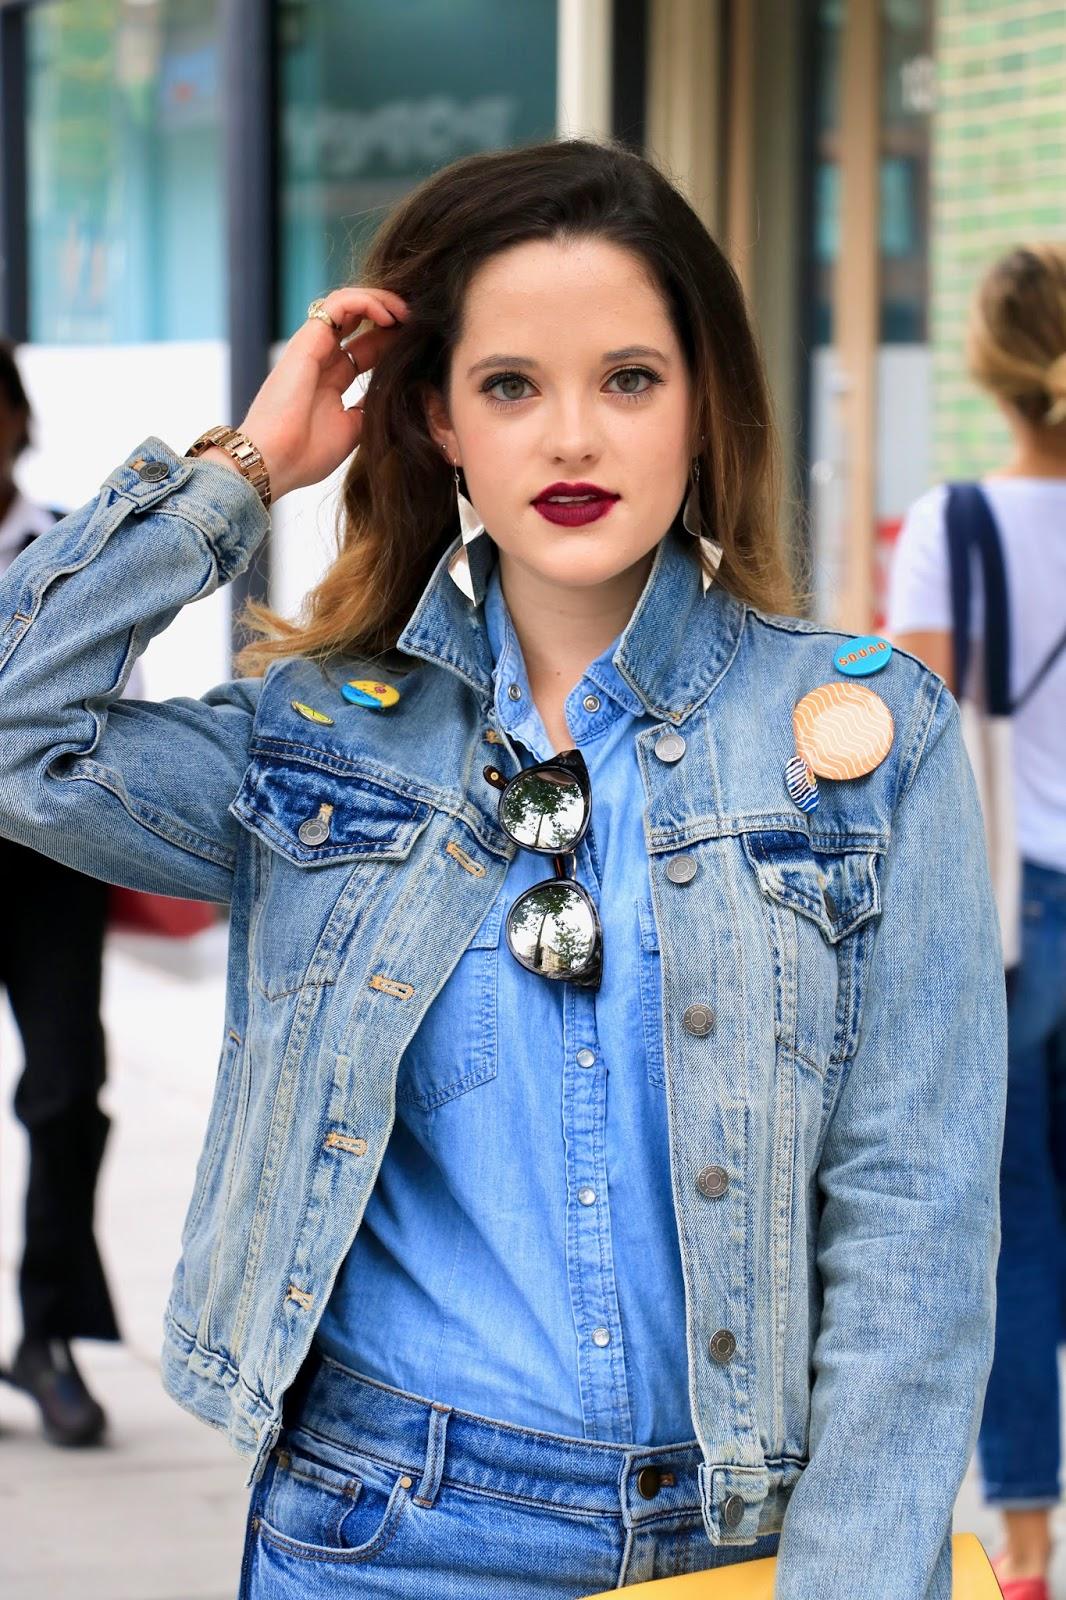 Nyc fashion blogger Kathleen Harper wearing street style